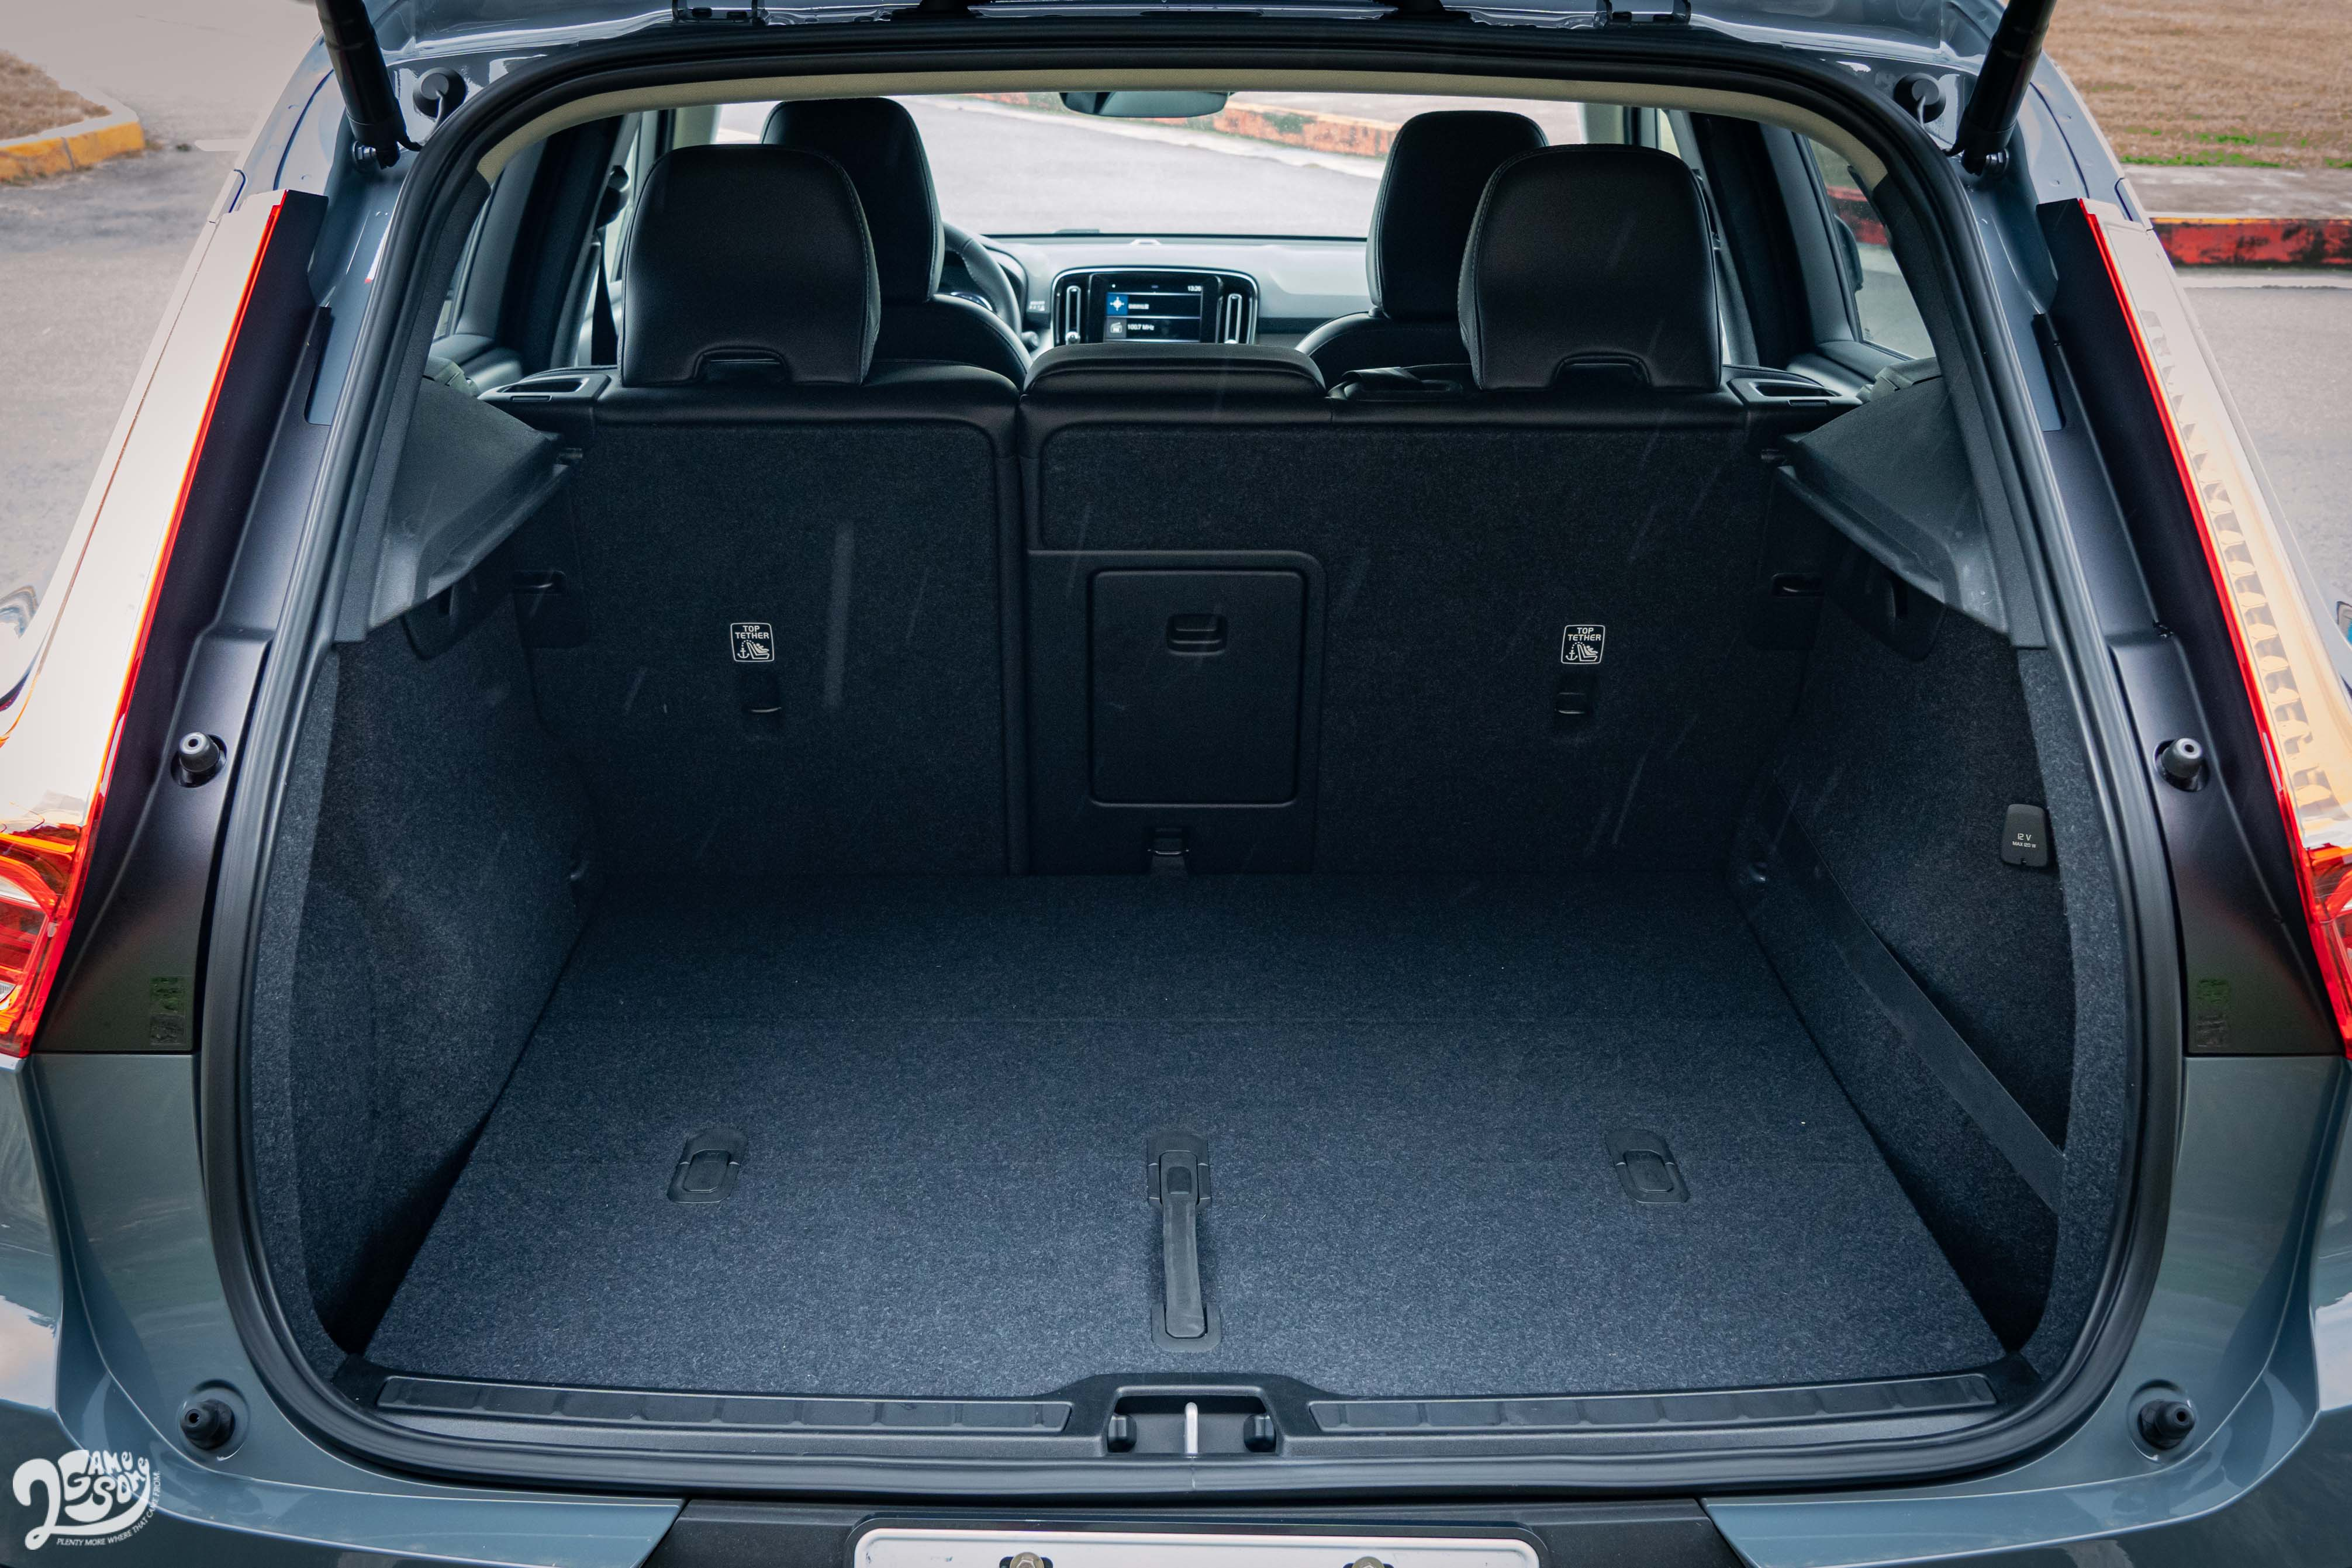 XC40 基本行李廂容積為 452 公升。